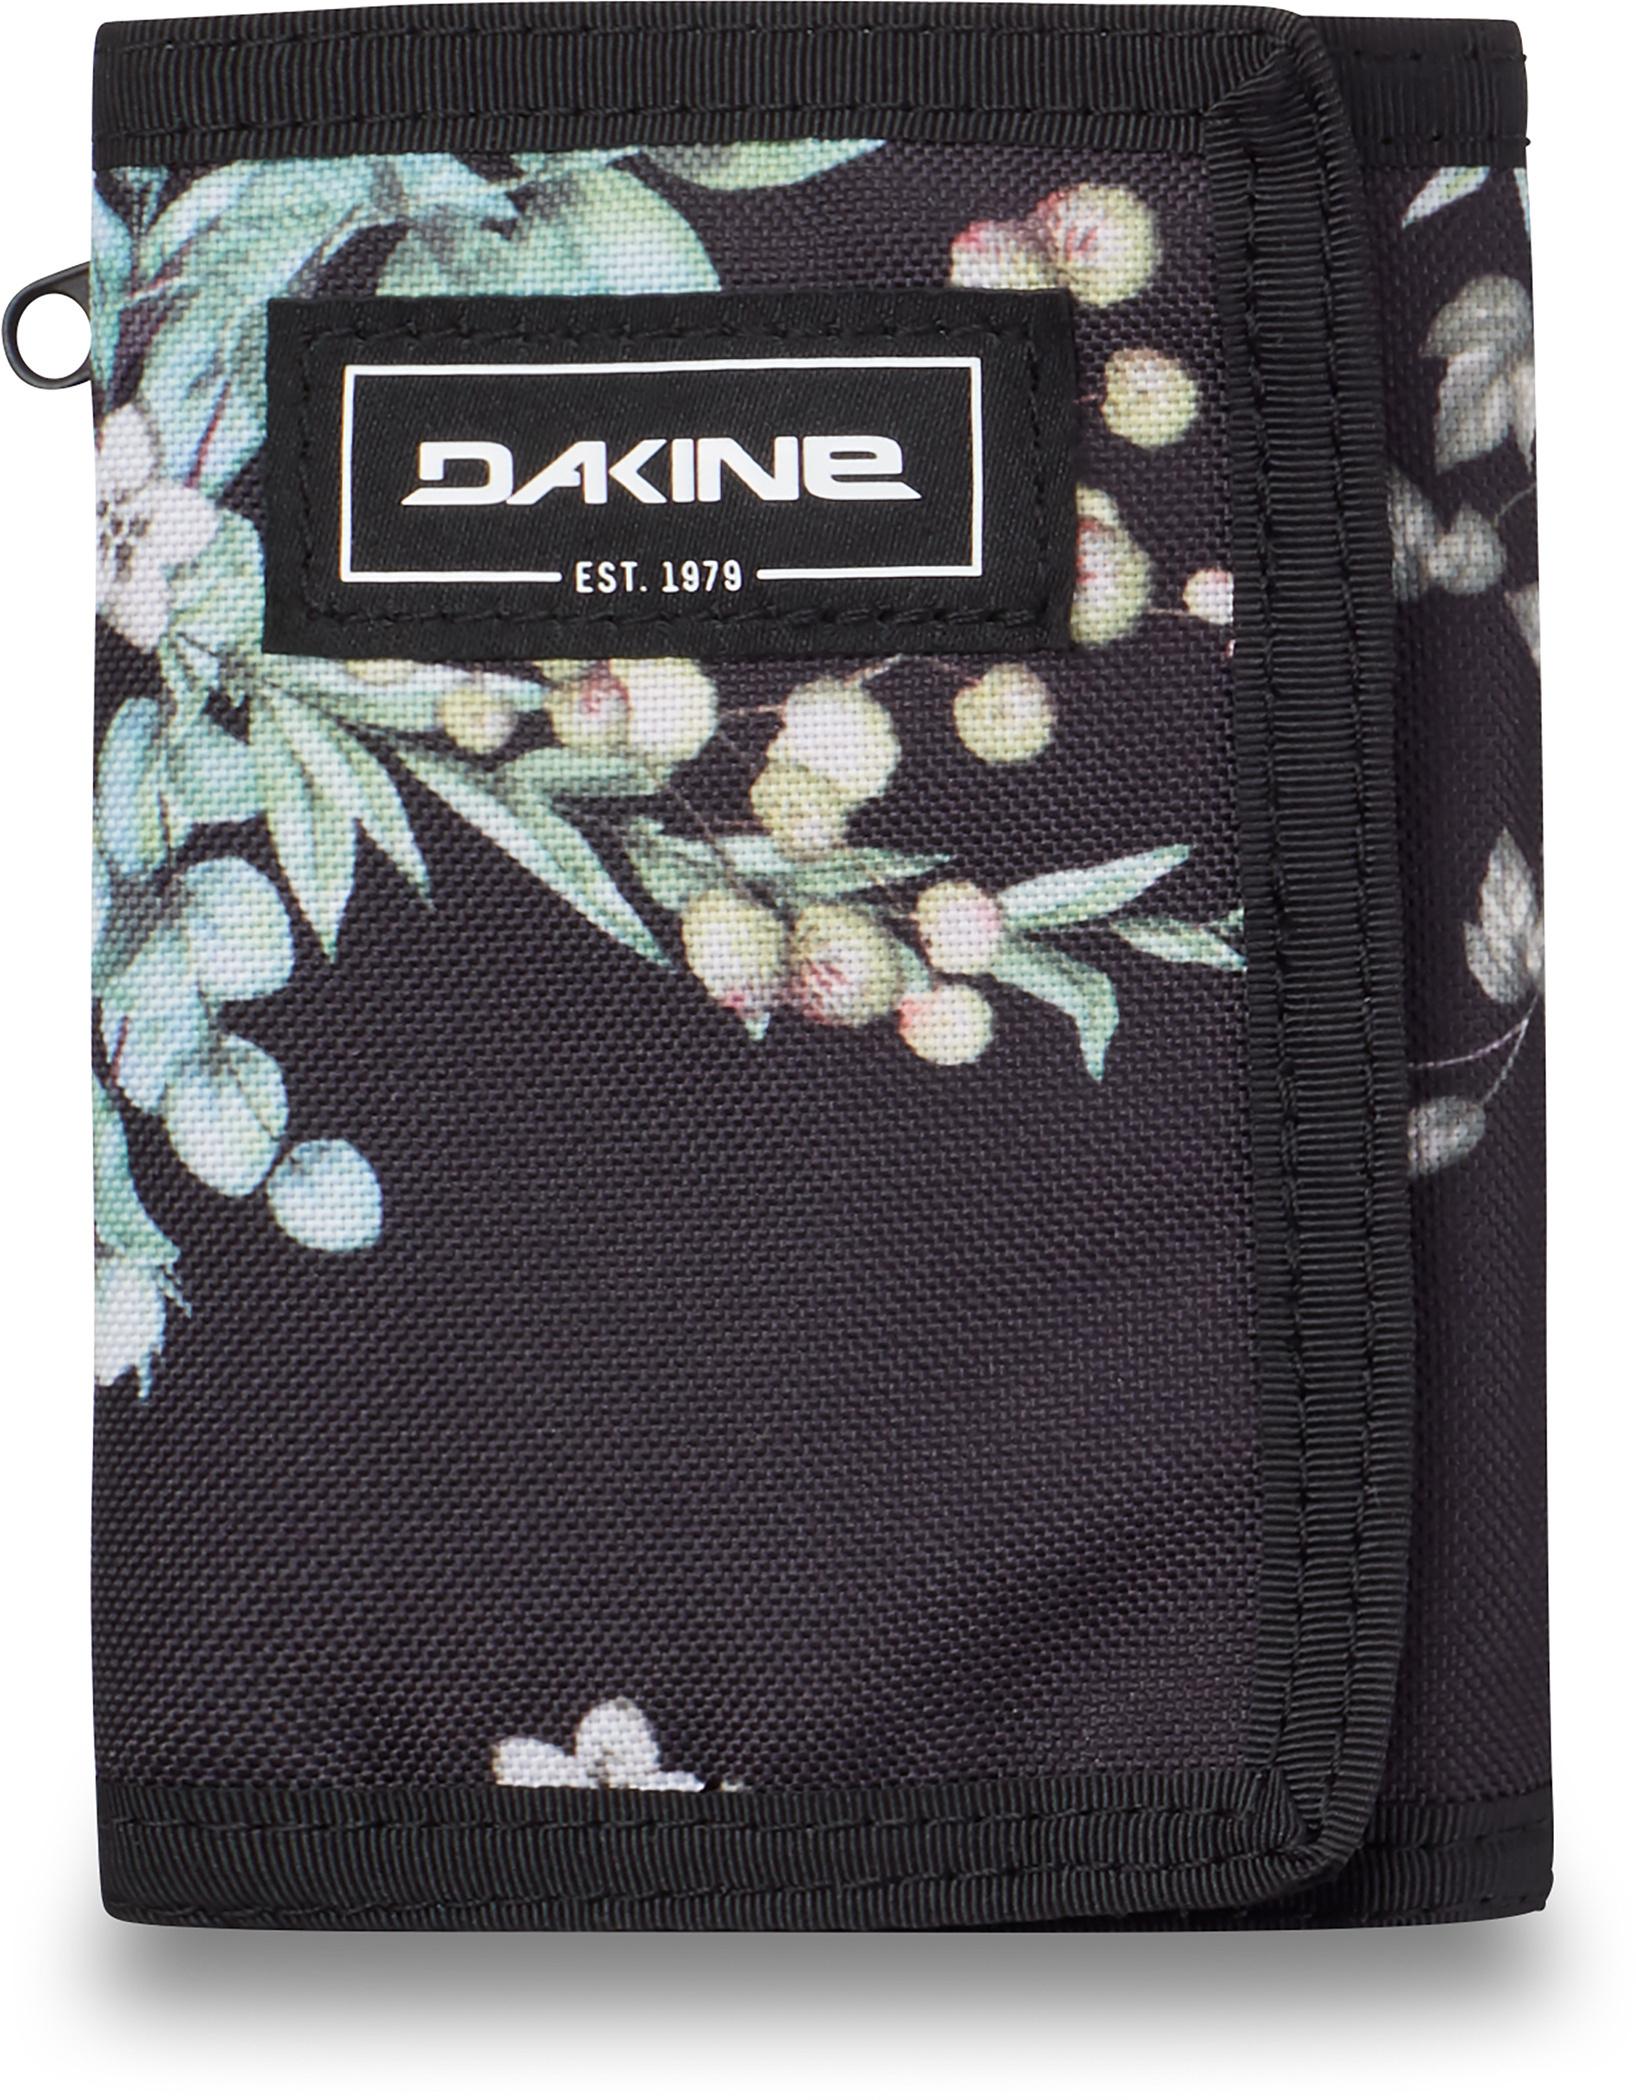 Dakine VERT RAIL WALLET Solstice Floral